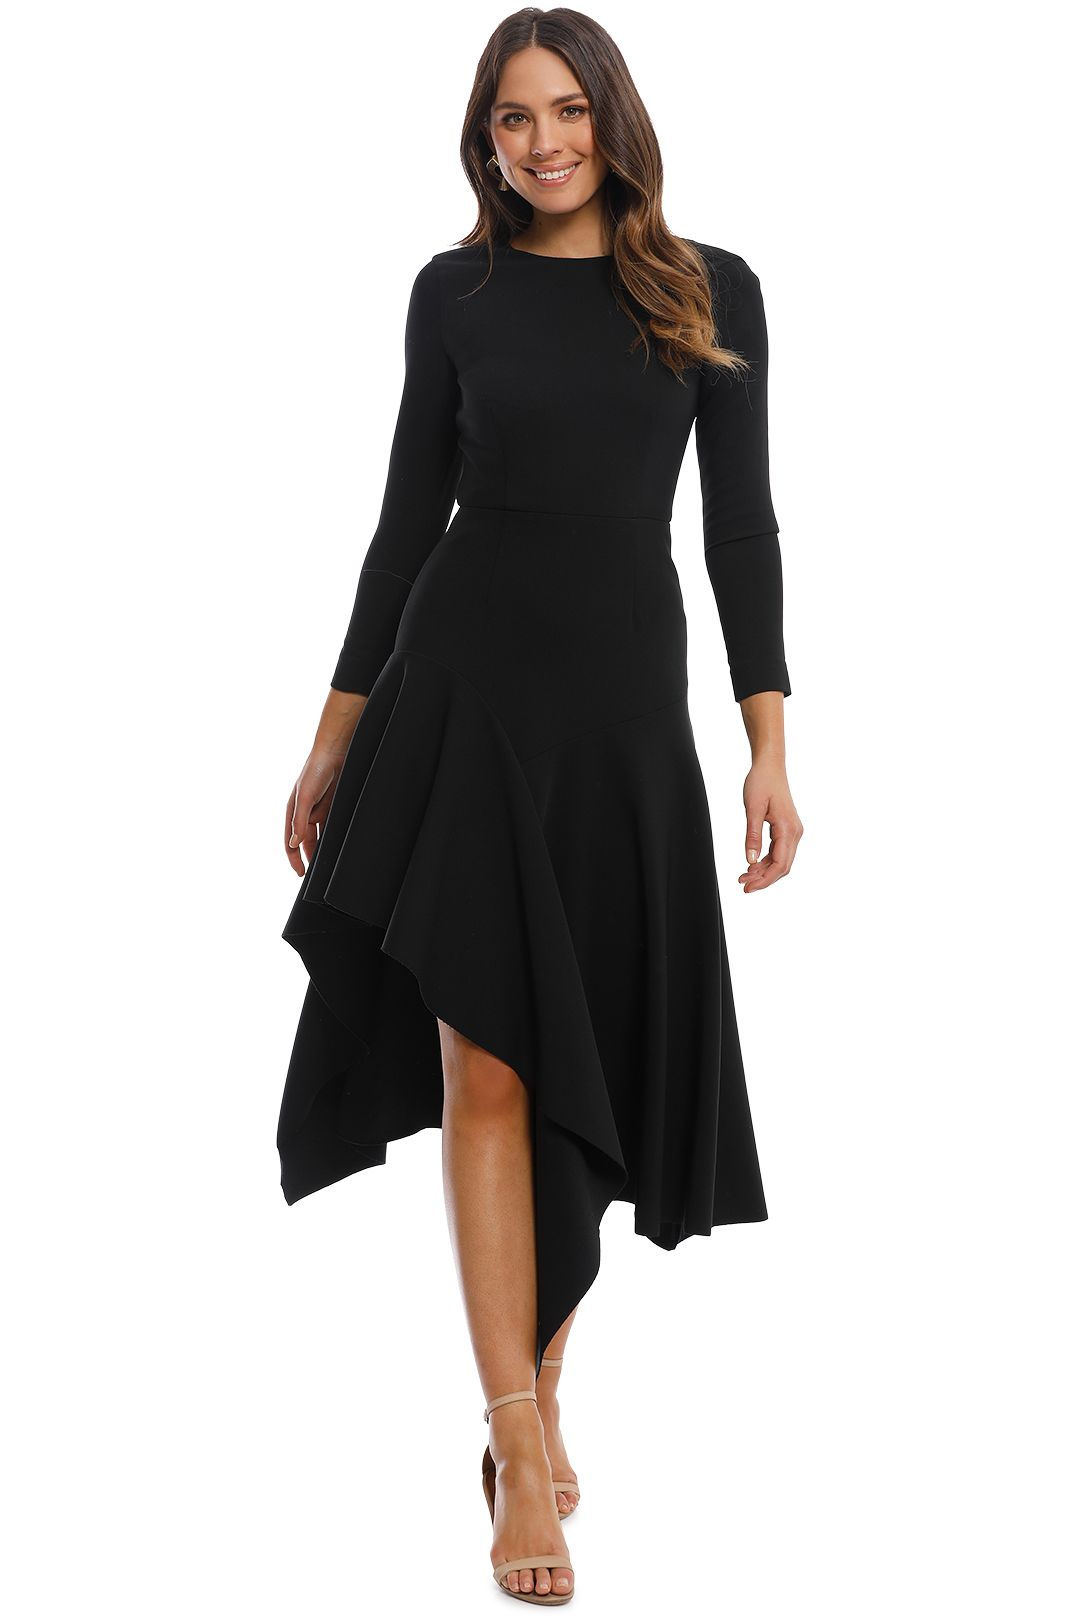 Talulah - Wonder LS Midi Dress - Black - Front